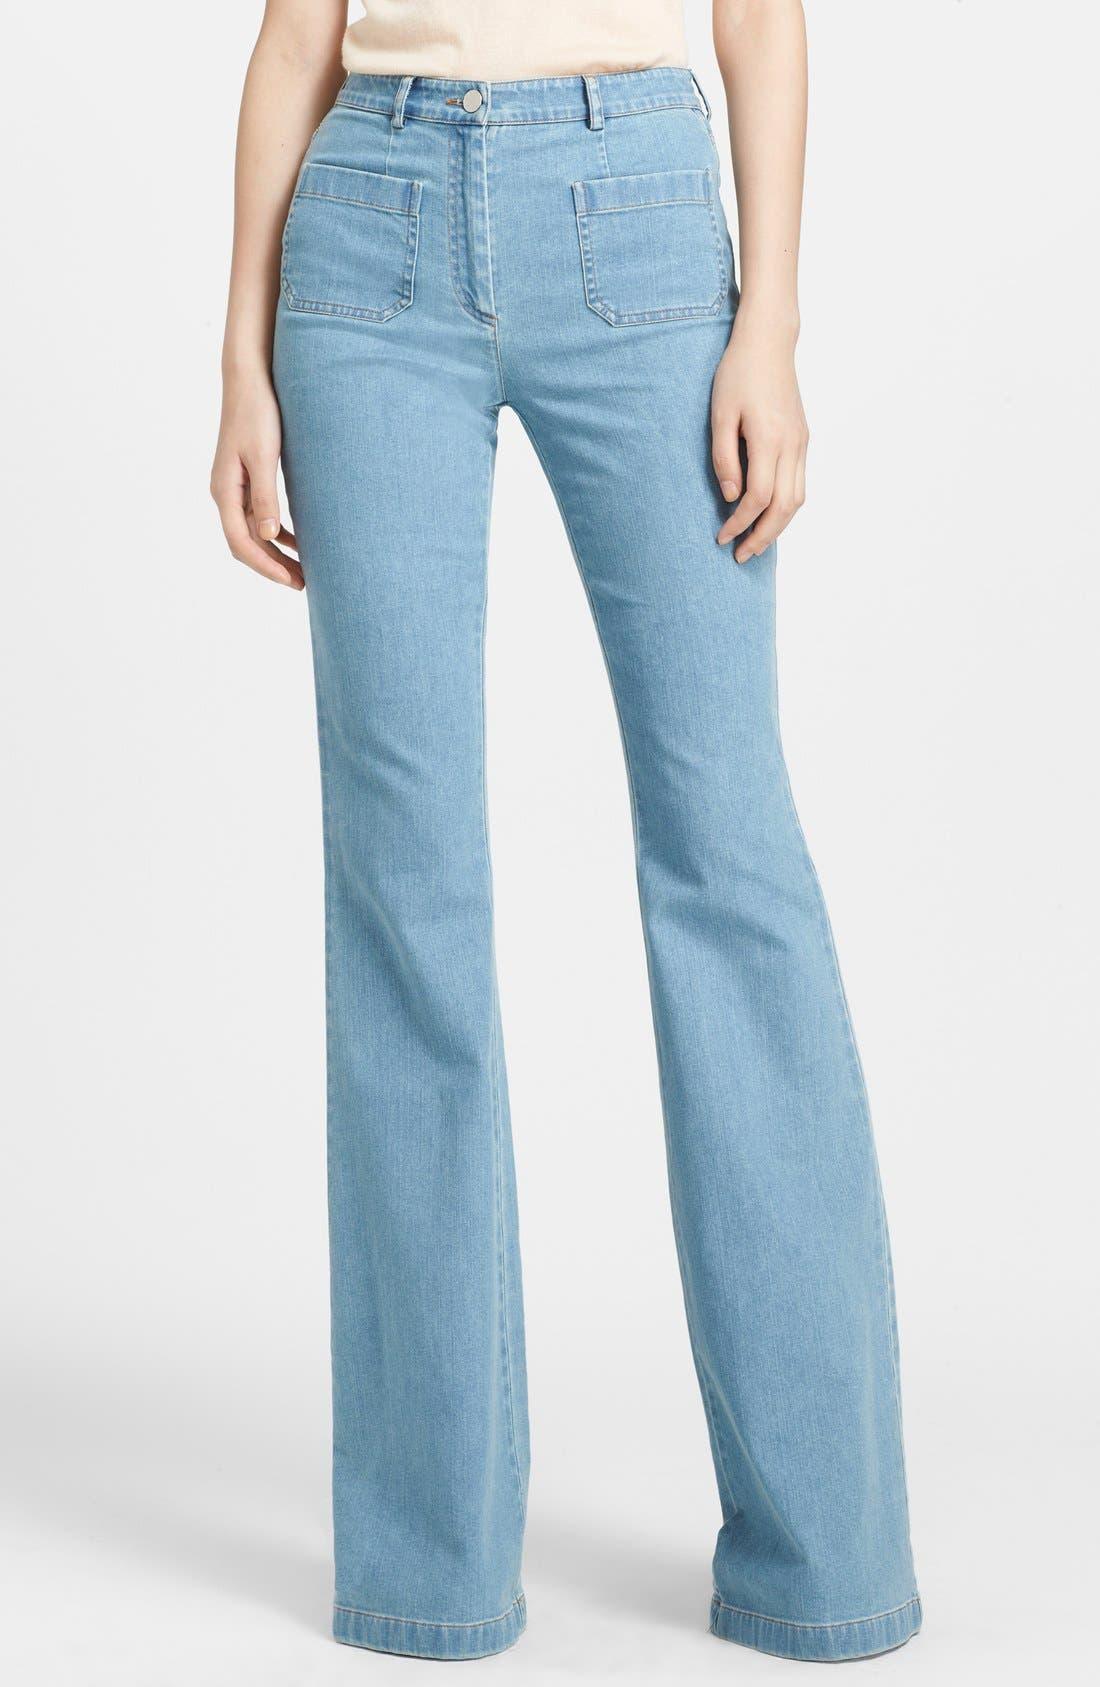 Alternate Image 1 Selected - Michael Kors Bell Bottom Stretch Jeans